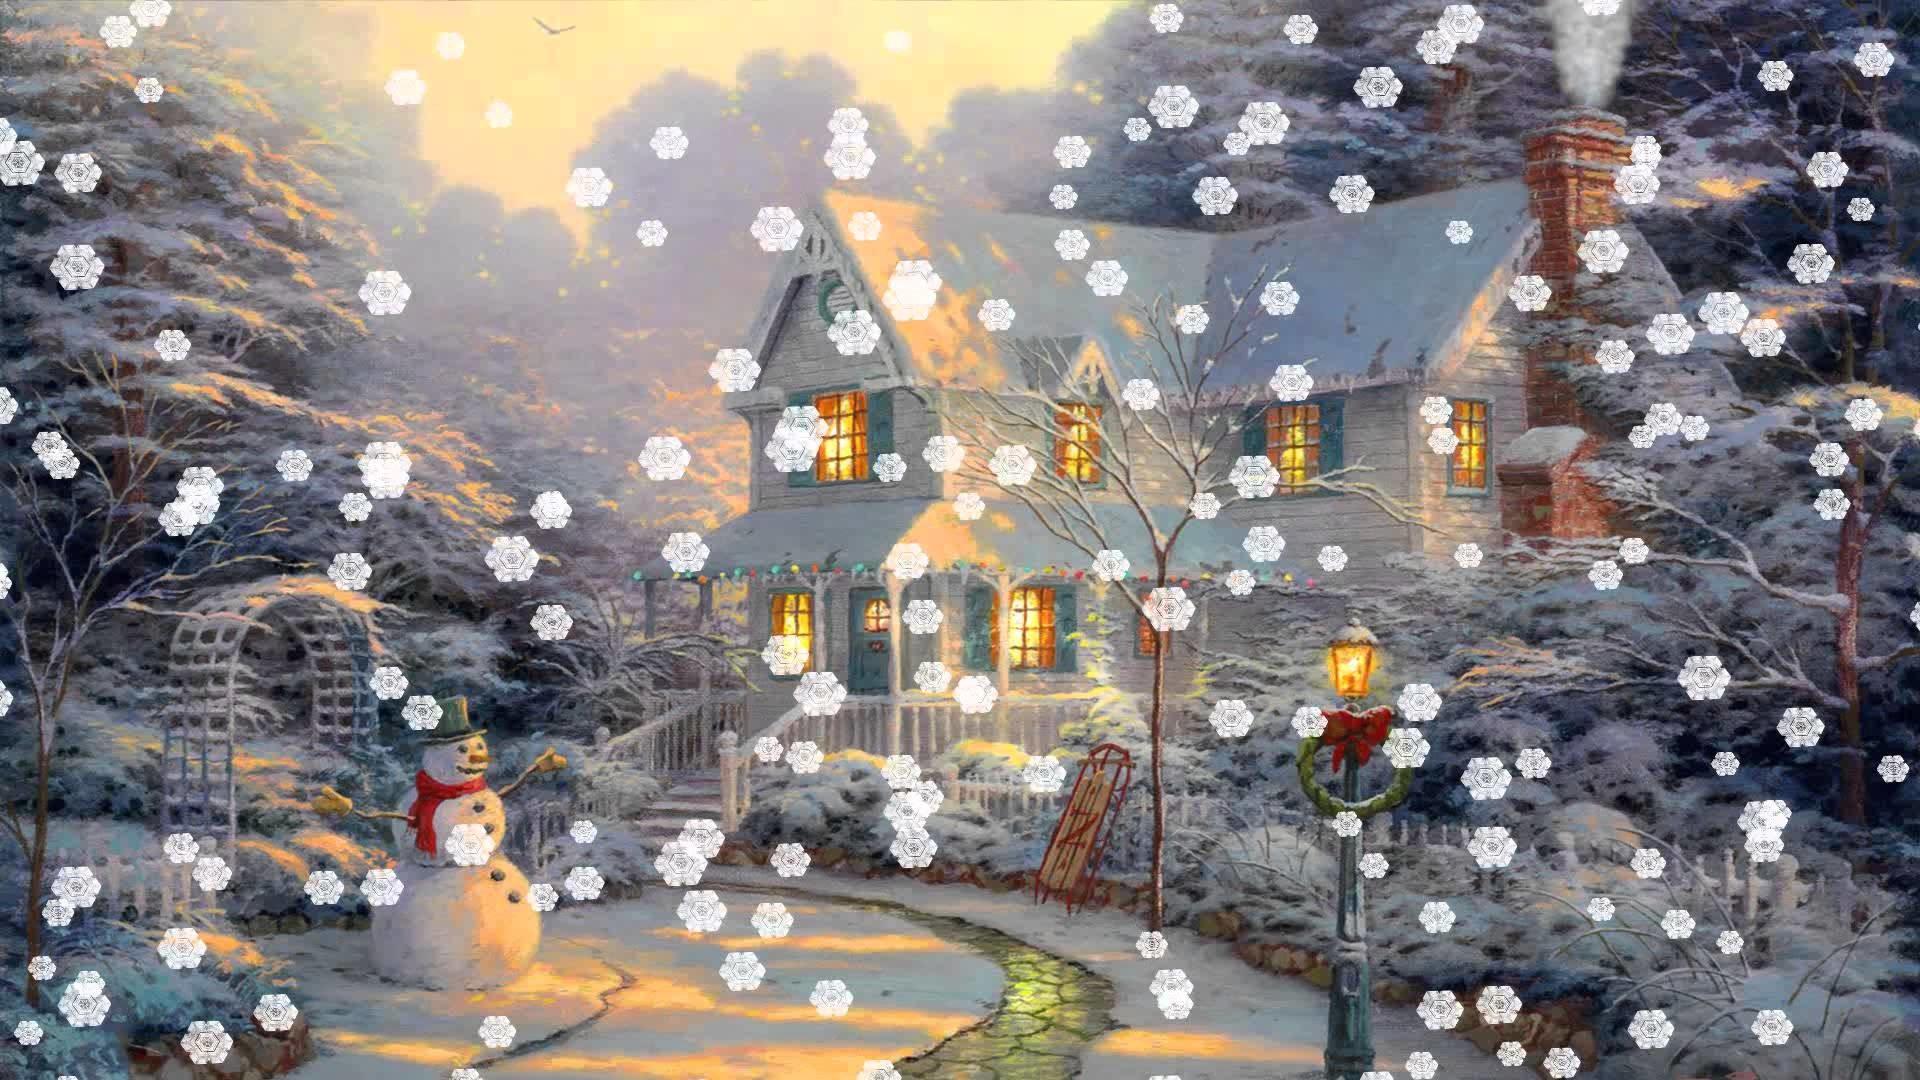 Res: 1920x1080, Christmas Eve Animated Wallpaper http://www.desktopanimated.com